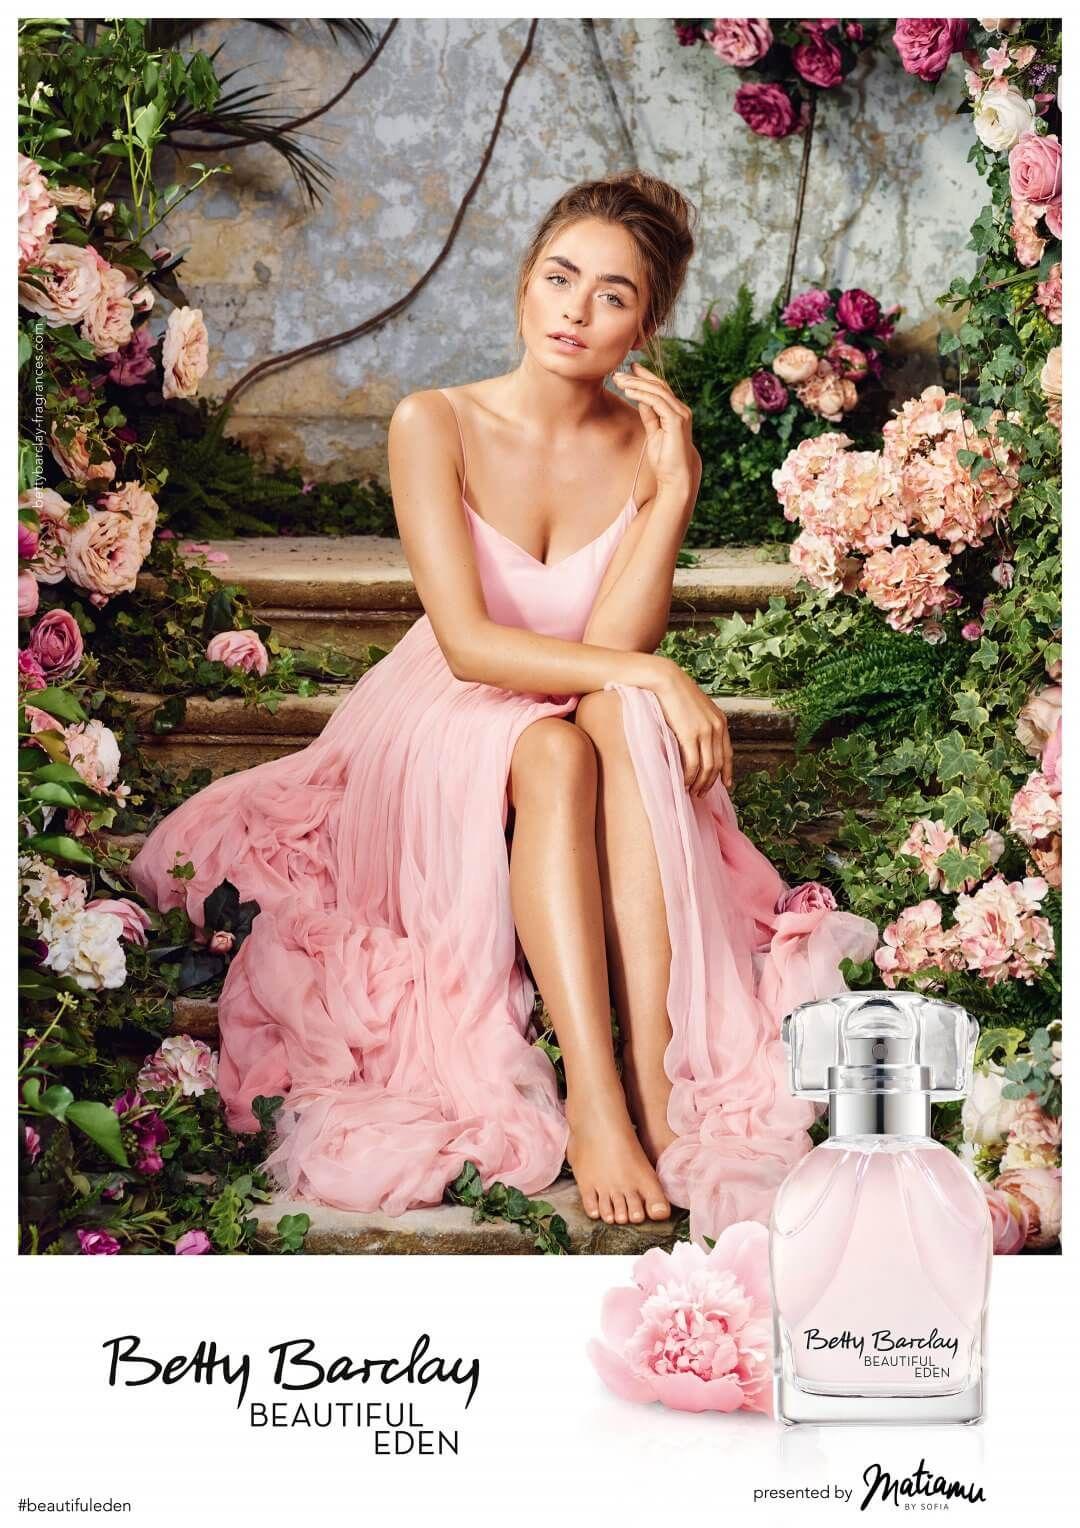 Beautiful Eden Betty Barclay Fragrance Wedding Girl Fashion Bridesmaid Dresses